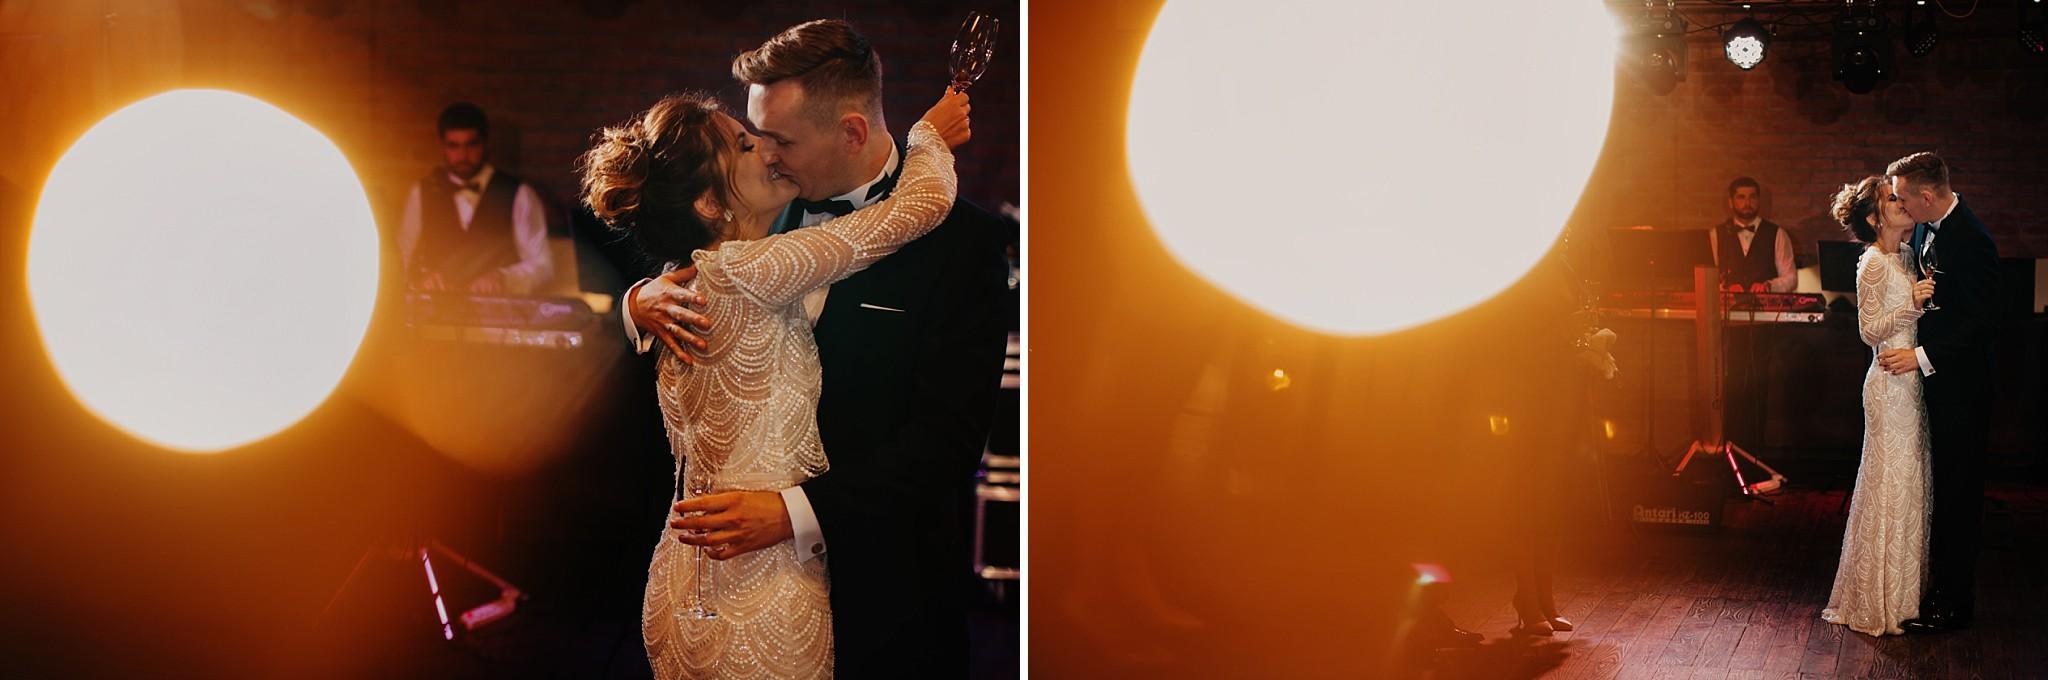 fotograf poznan wesele dobra truskawka piekne wesele pod poznaniem wesele w dobrej truskawce piekna para mloda slub marzen slub koronawirus slub listopad wesele koronawirus 297